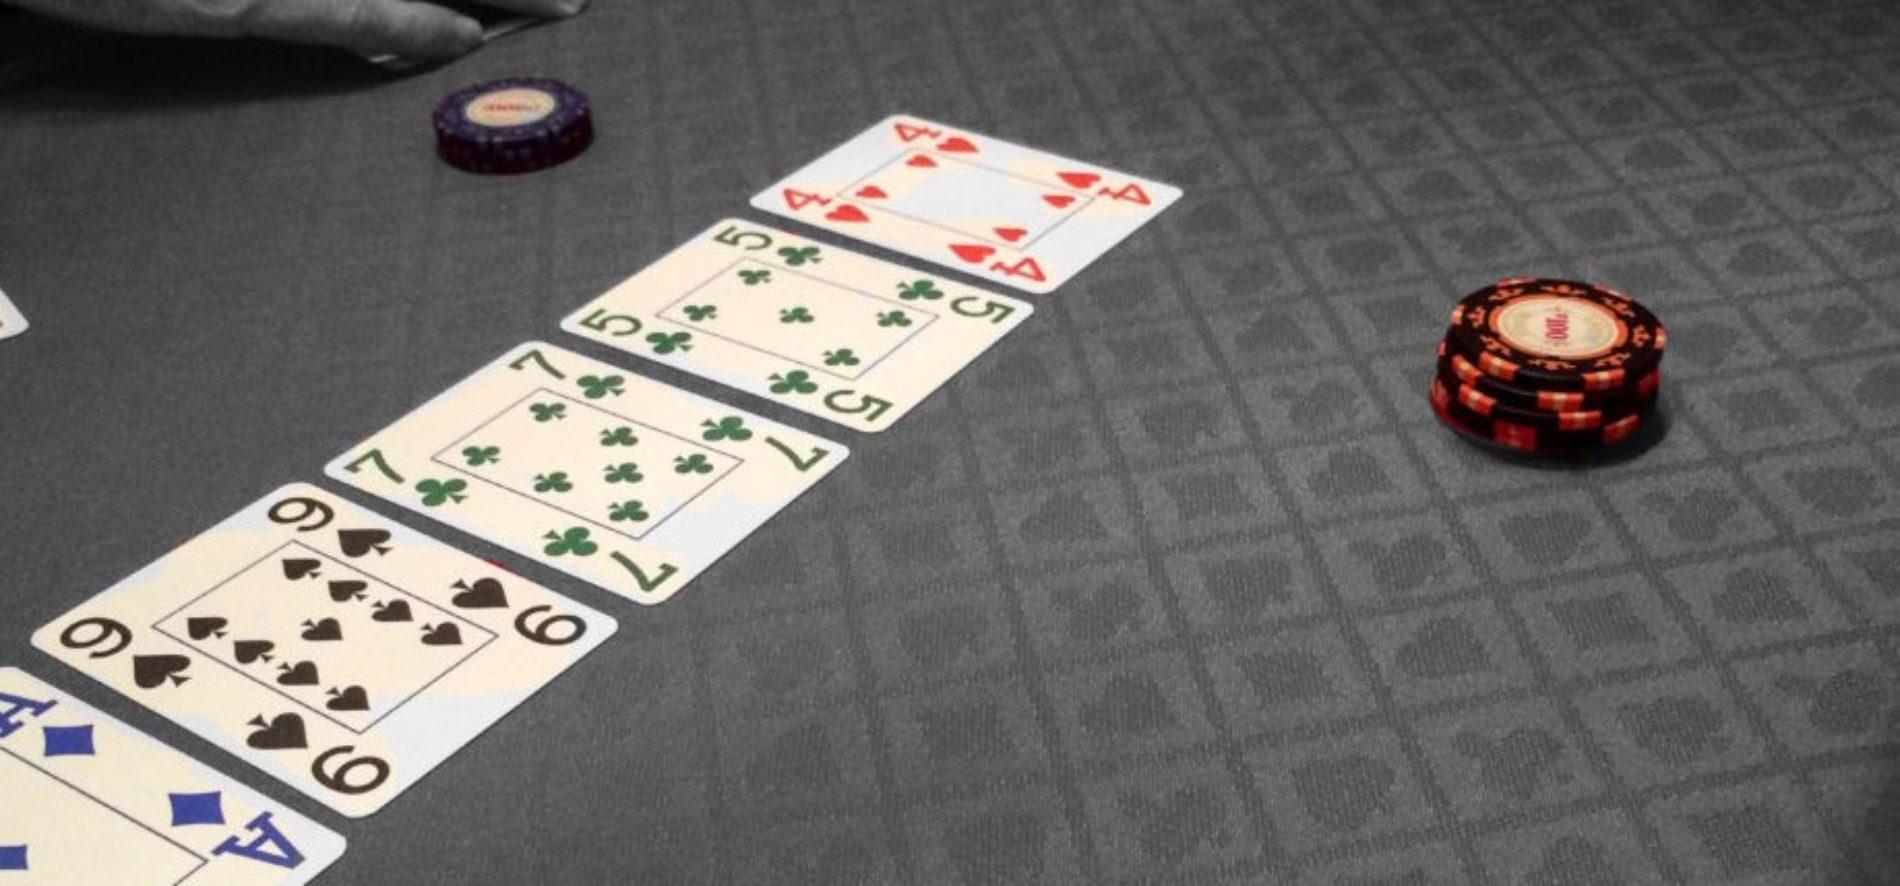 Comprendre et corriger ses propres erreurs au poker